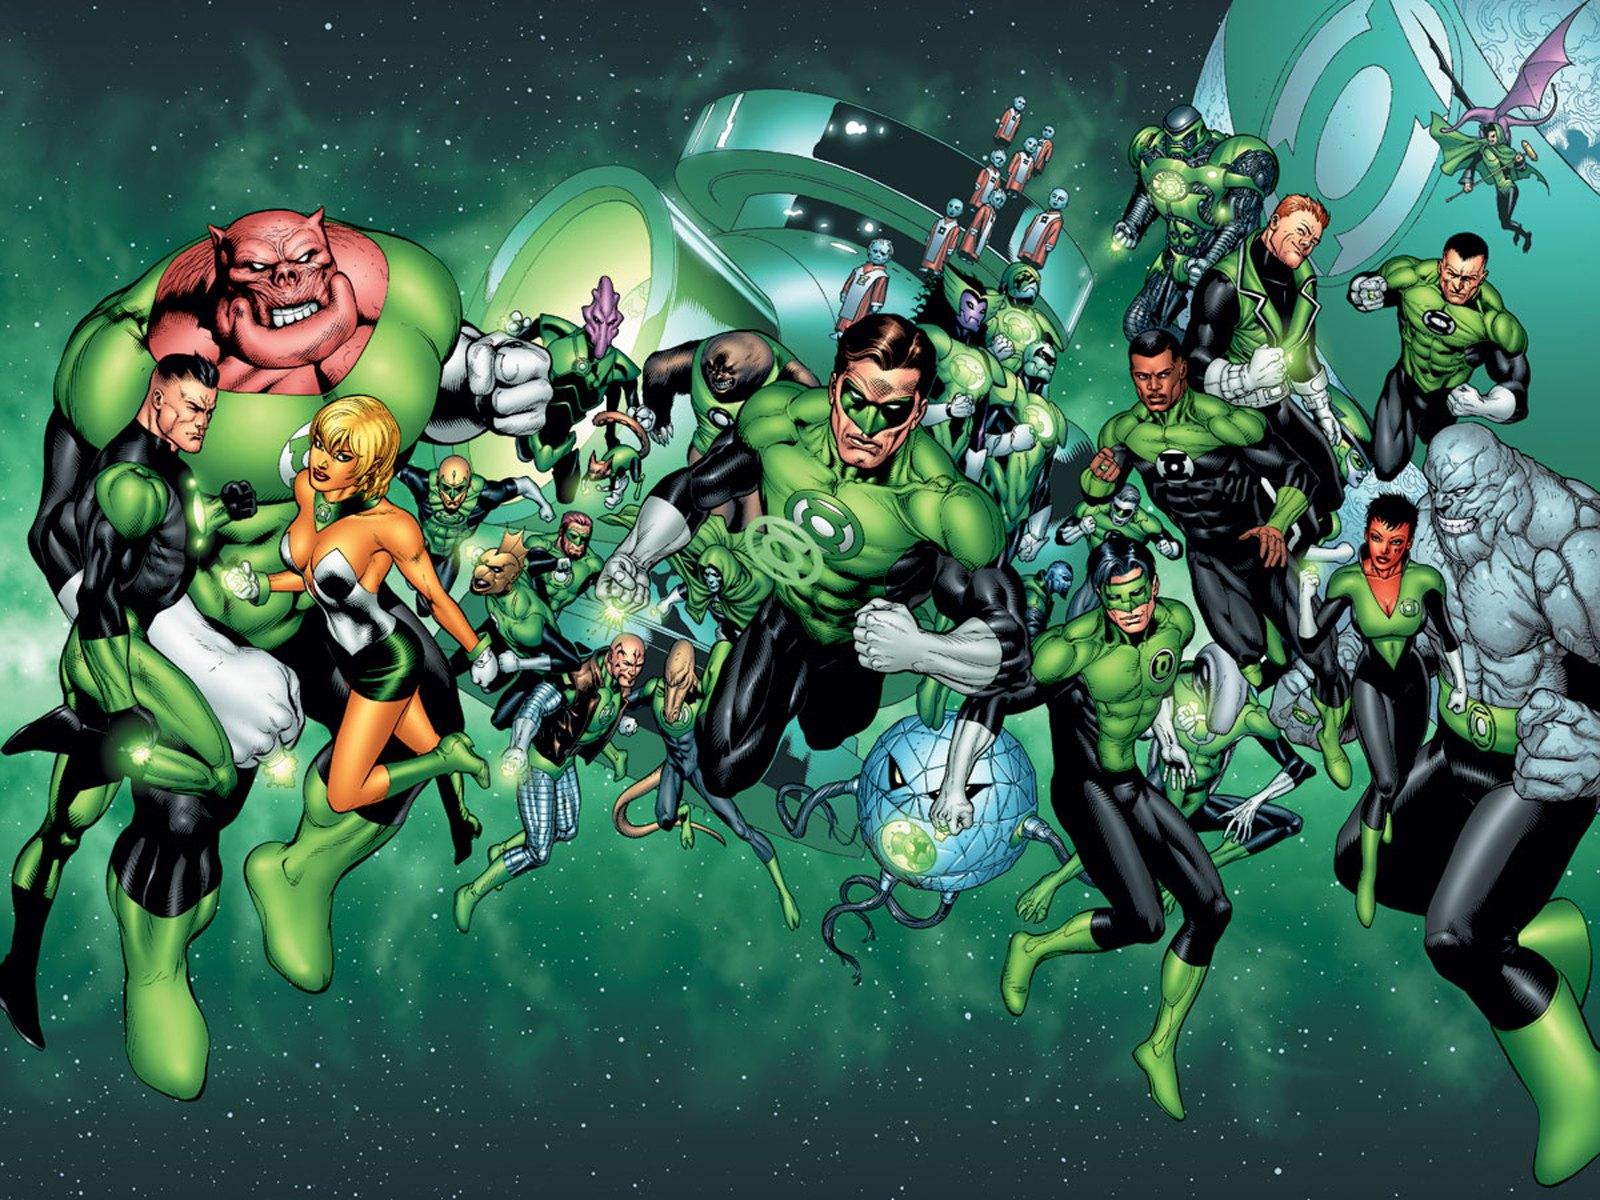 Green Lantern Corps wallpapers Comics HQ Green Lantern Corps 1600x1200